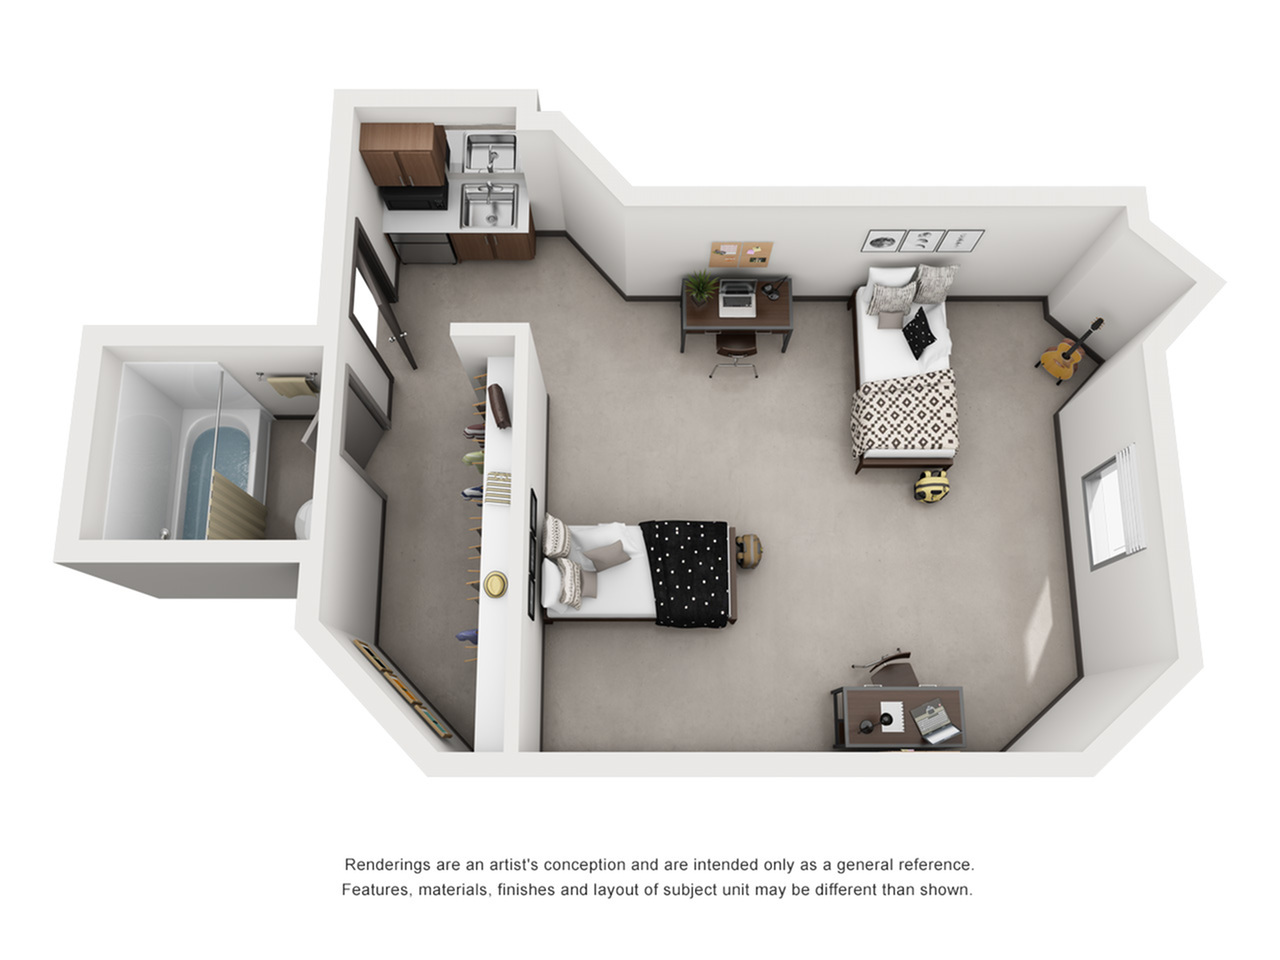 Private Dorms in Austin TX | Dobie Twenty21 Student Spaces